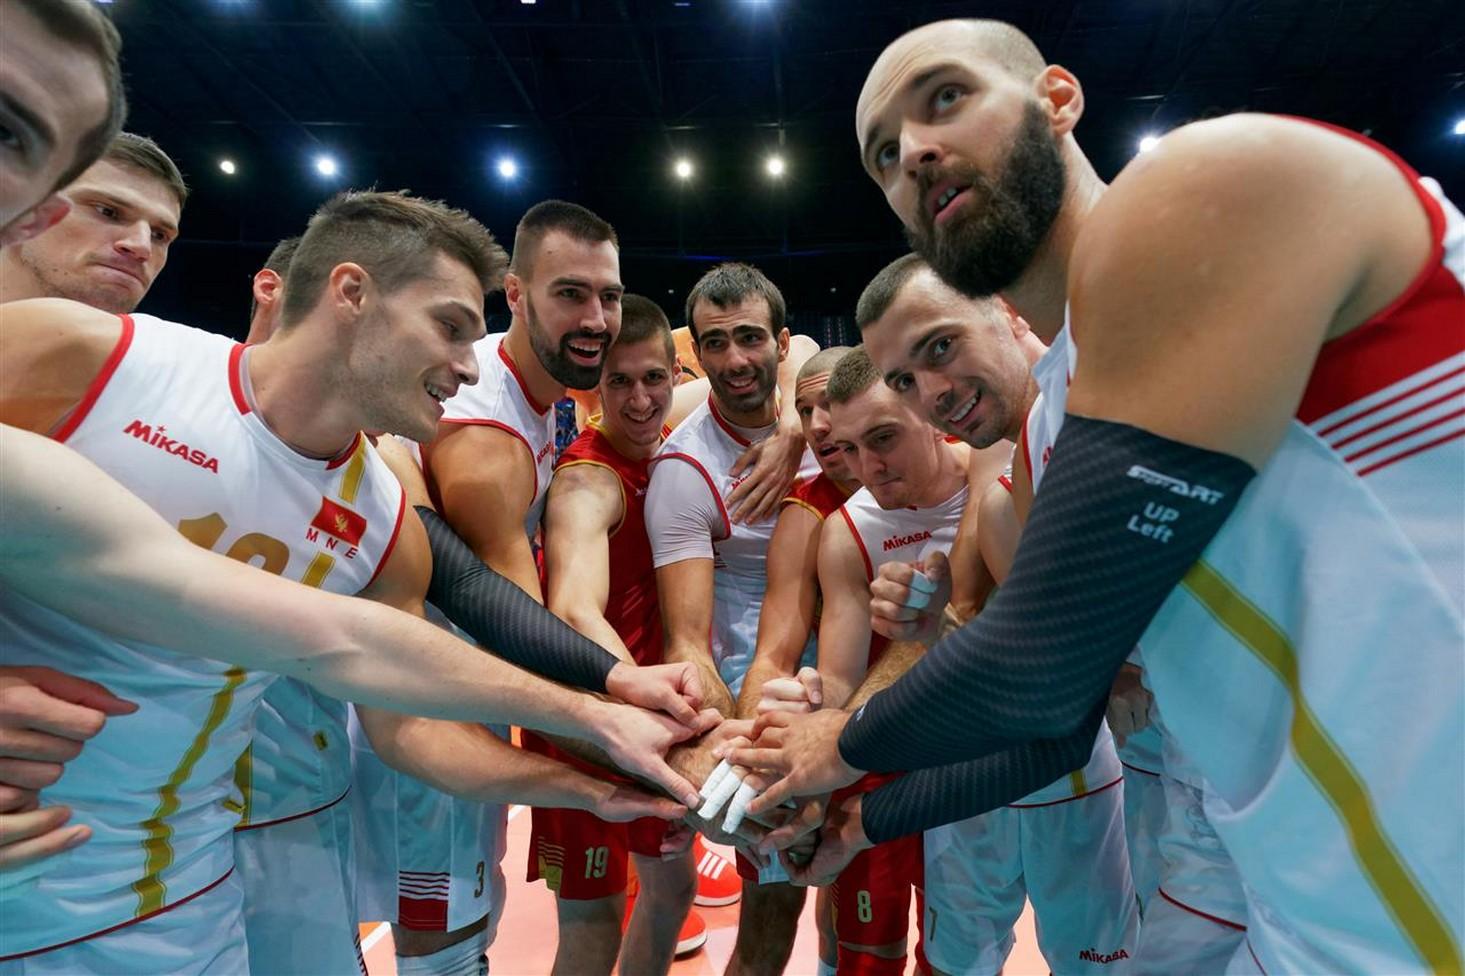 crna gora estonija seniori reprezentacija odbojkasi evropsko prvenstvo 014